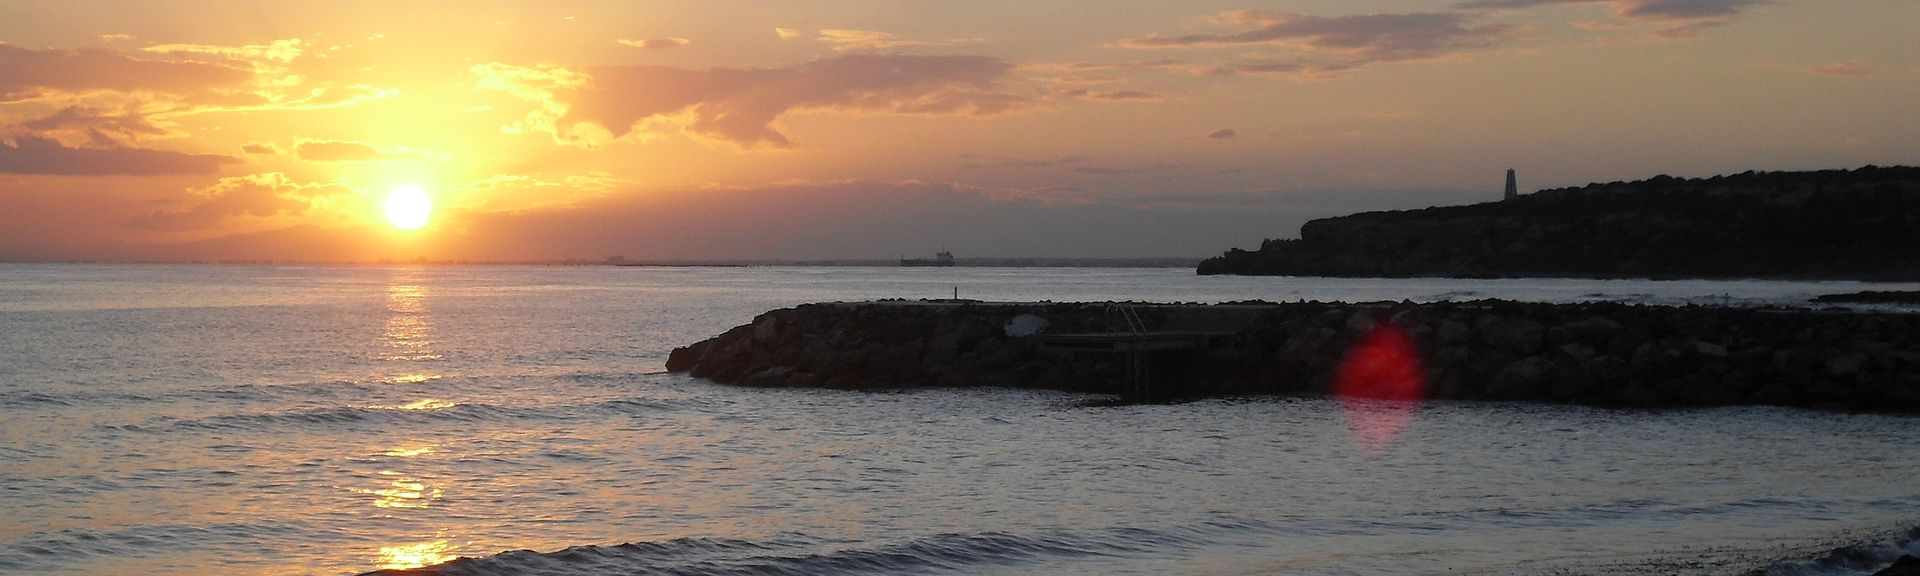 Boğaztepe, Nordzypern